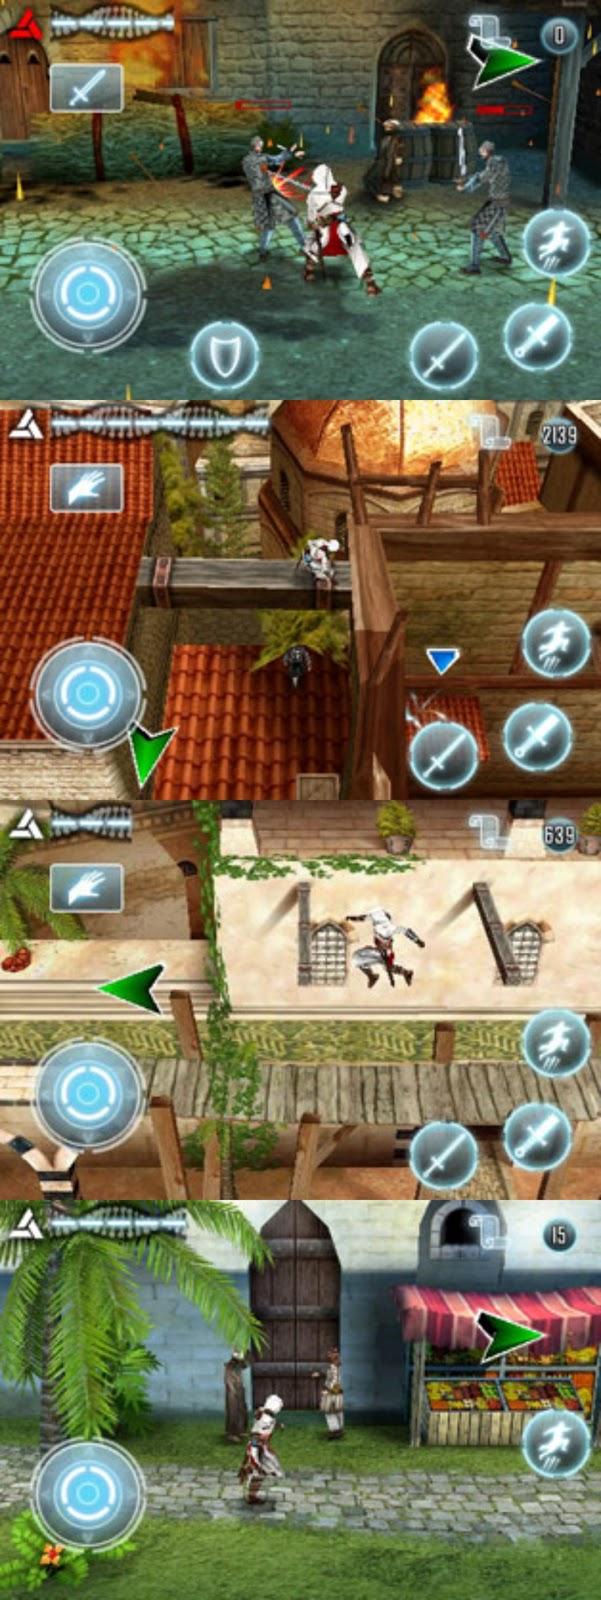 Assassin's Creed™ - Altaïr's Chronicles HD Apk screenshot